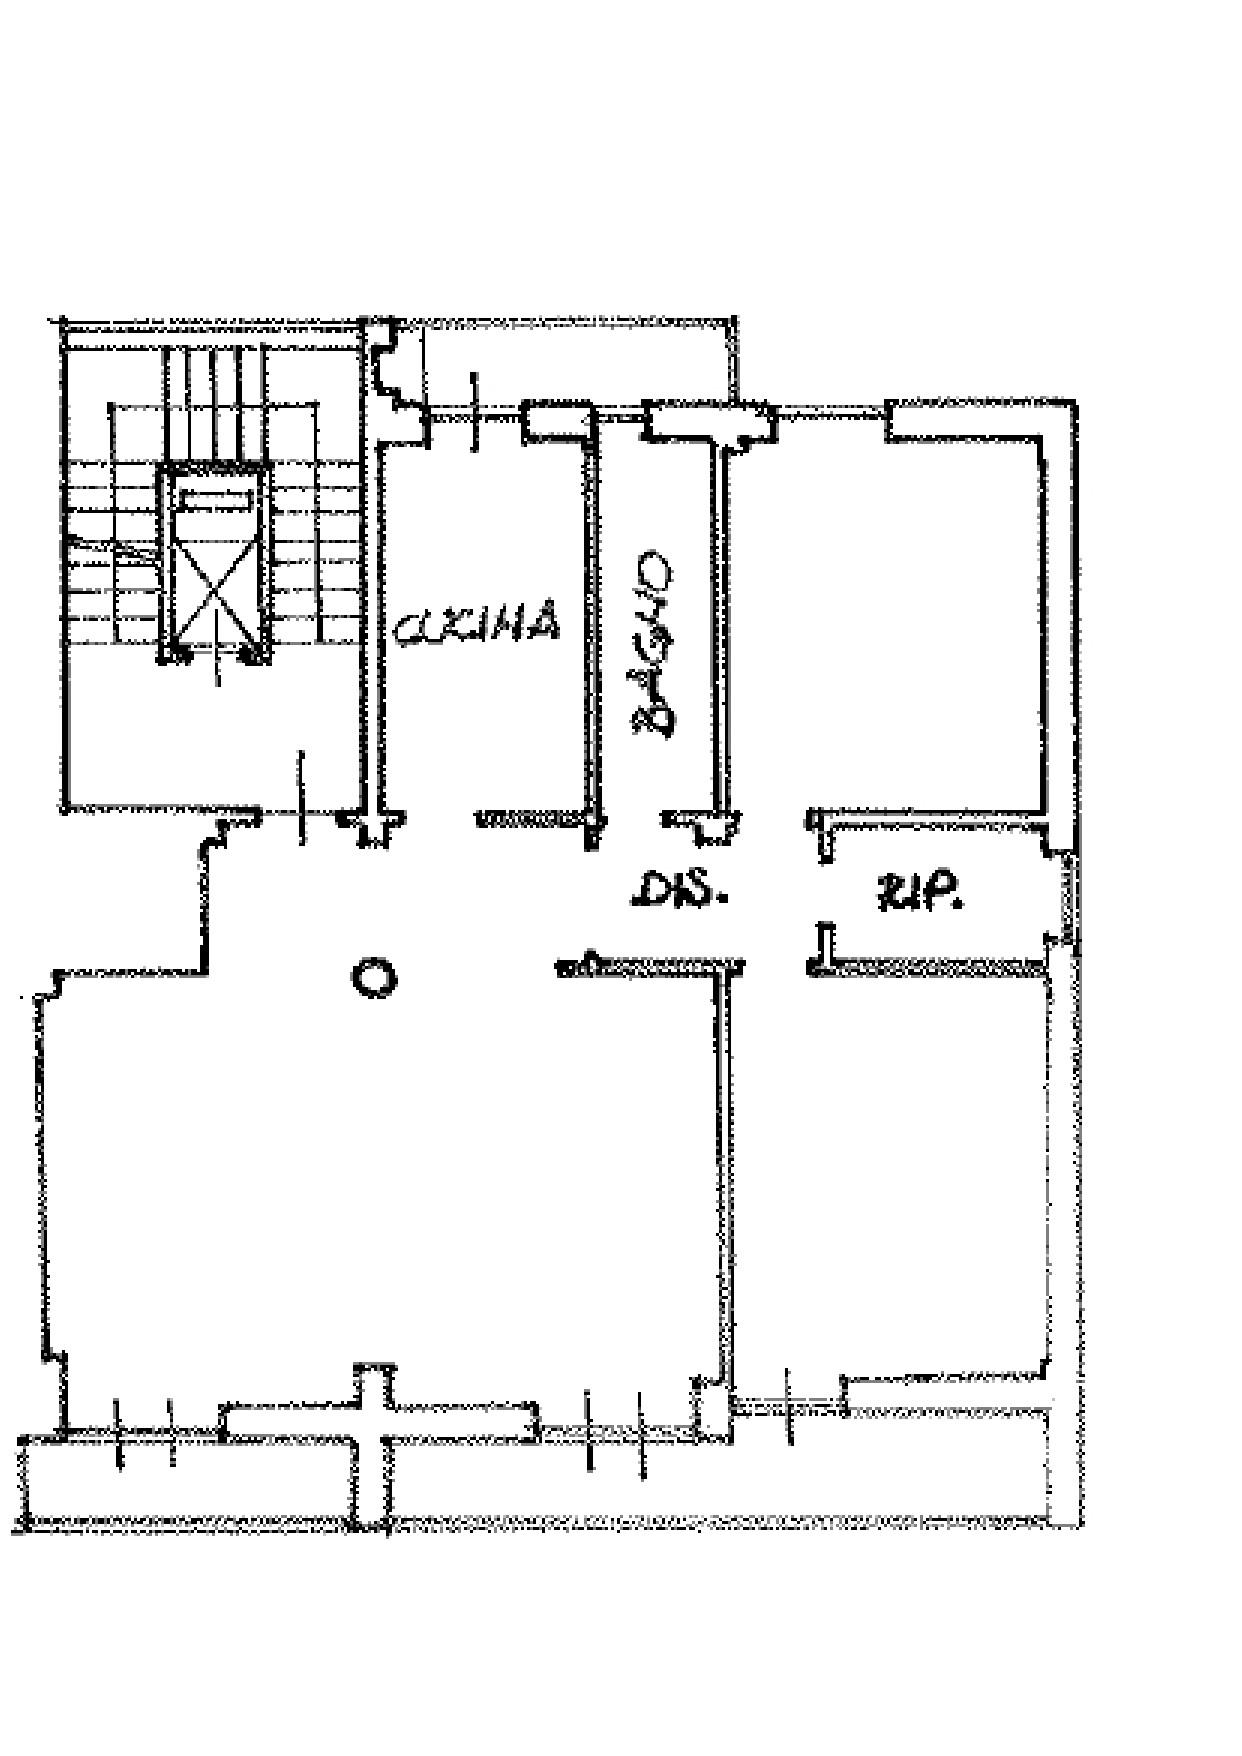 Appartamento in vendita, rif. K109 (Planimetria 1/1)